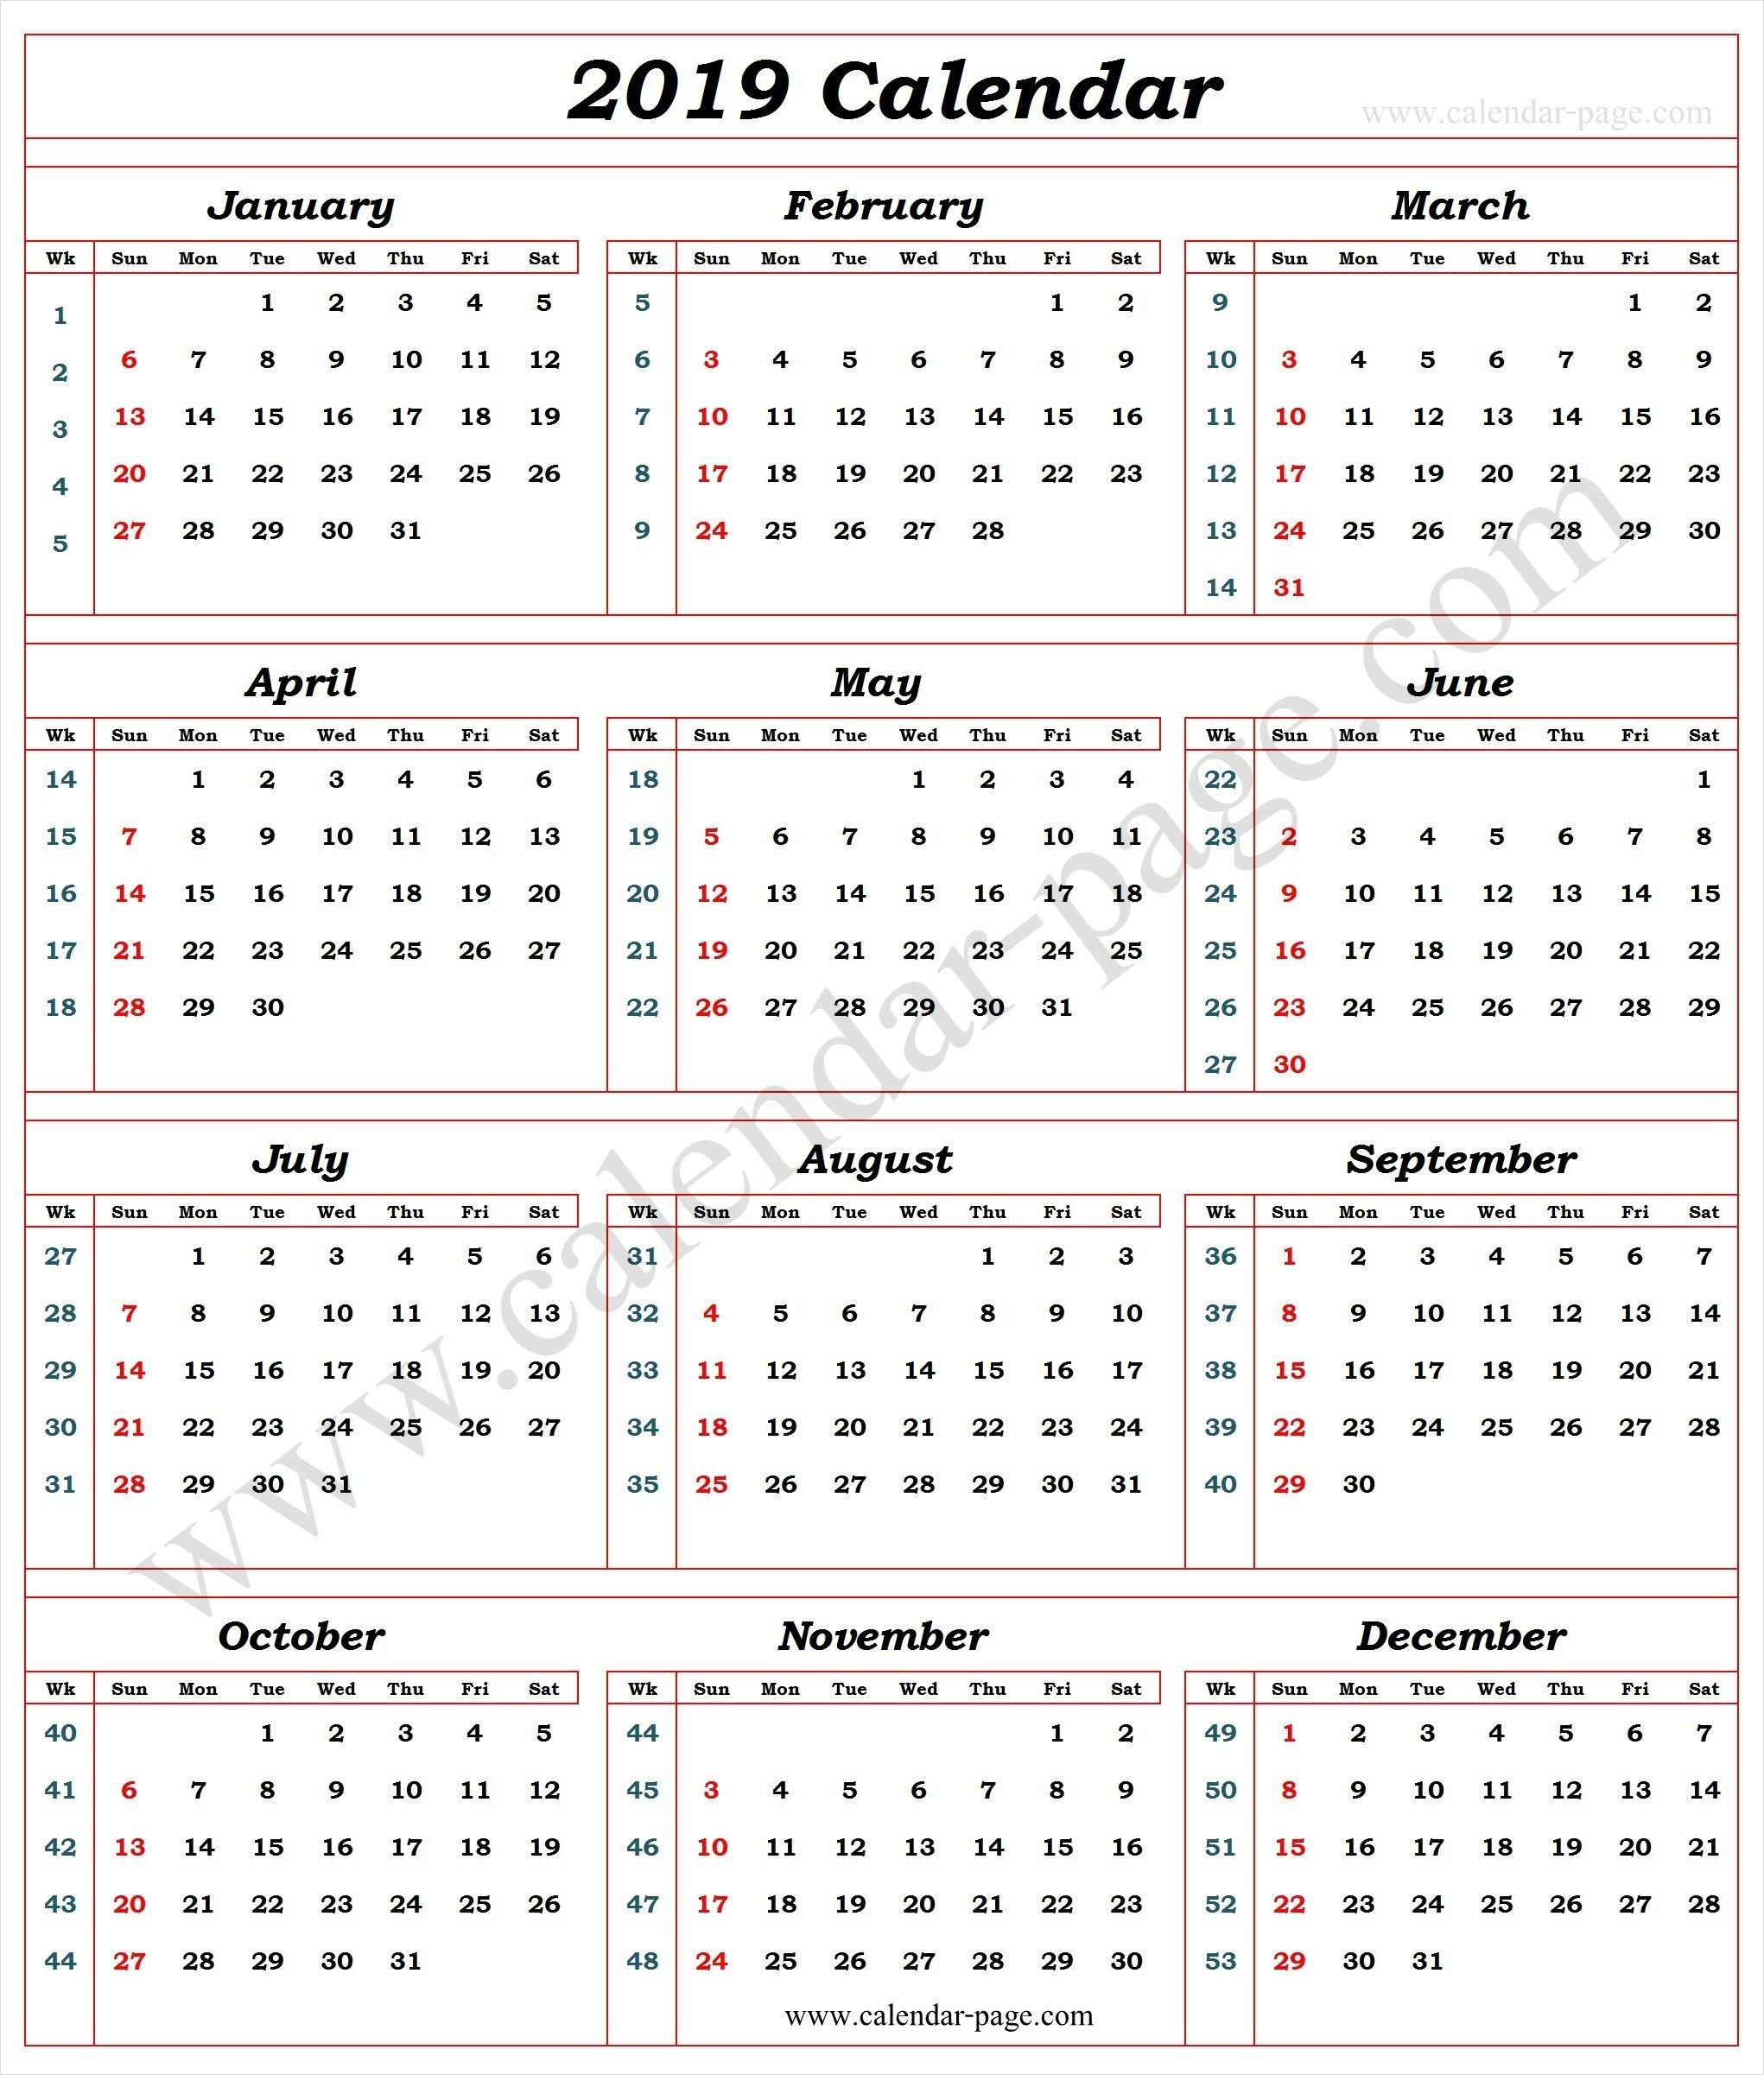 Calendar 2019 With Week Numbers | 2019 Calendar Template | Calendar Calendar Week 9 2019